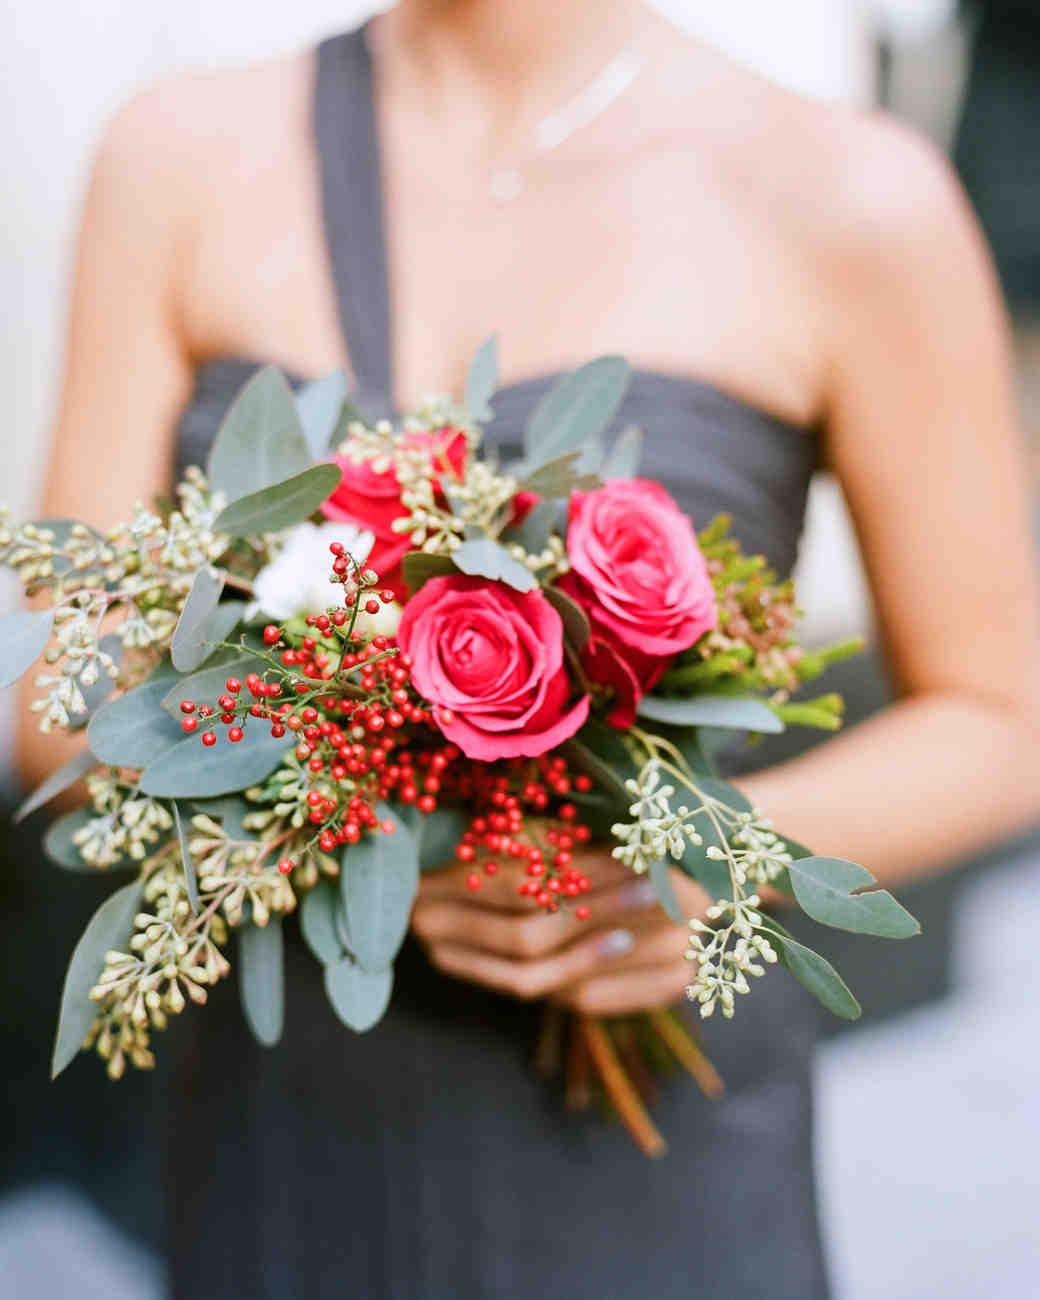 real-weddings-jess-greg-0811-192.jpg